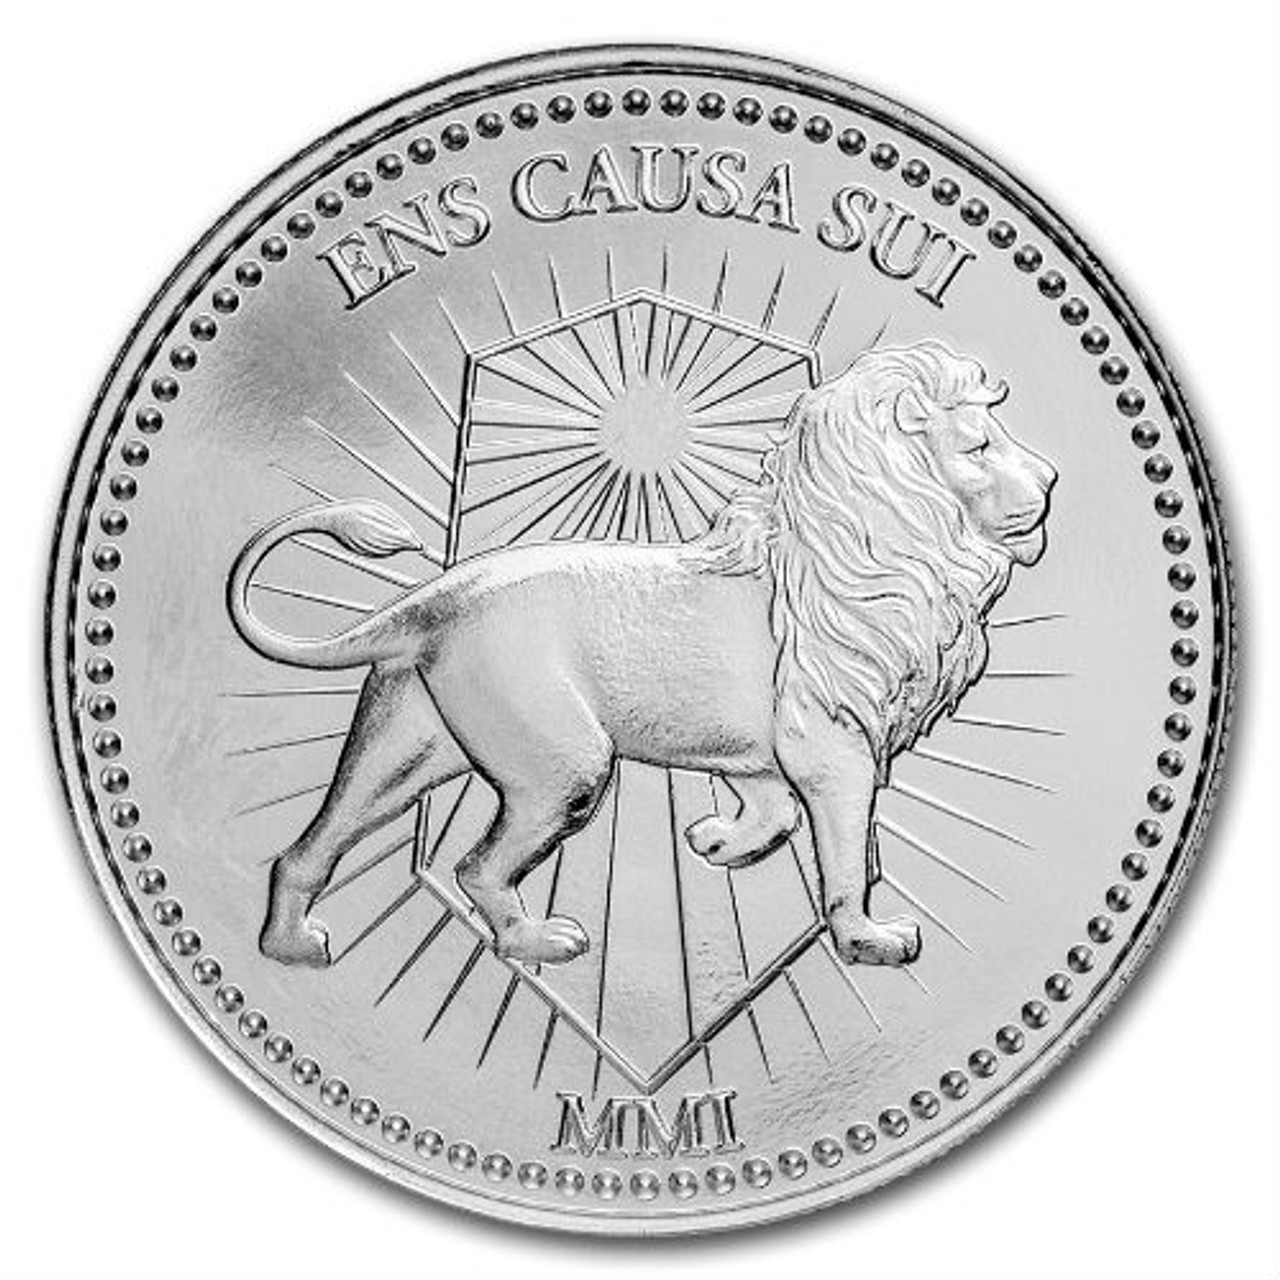 John Wick Continental Coin 1oz Silver BU Round